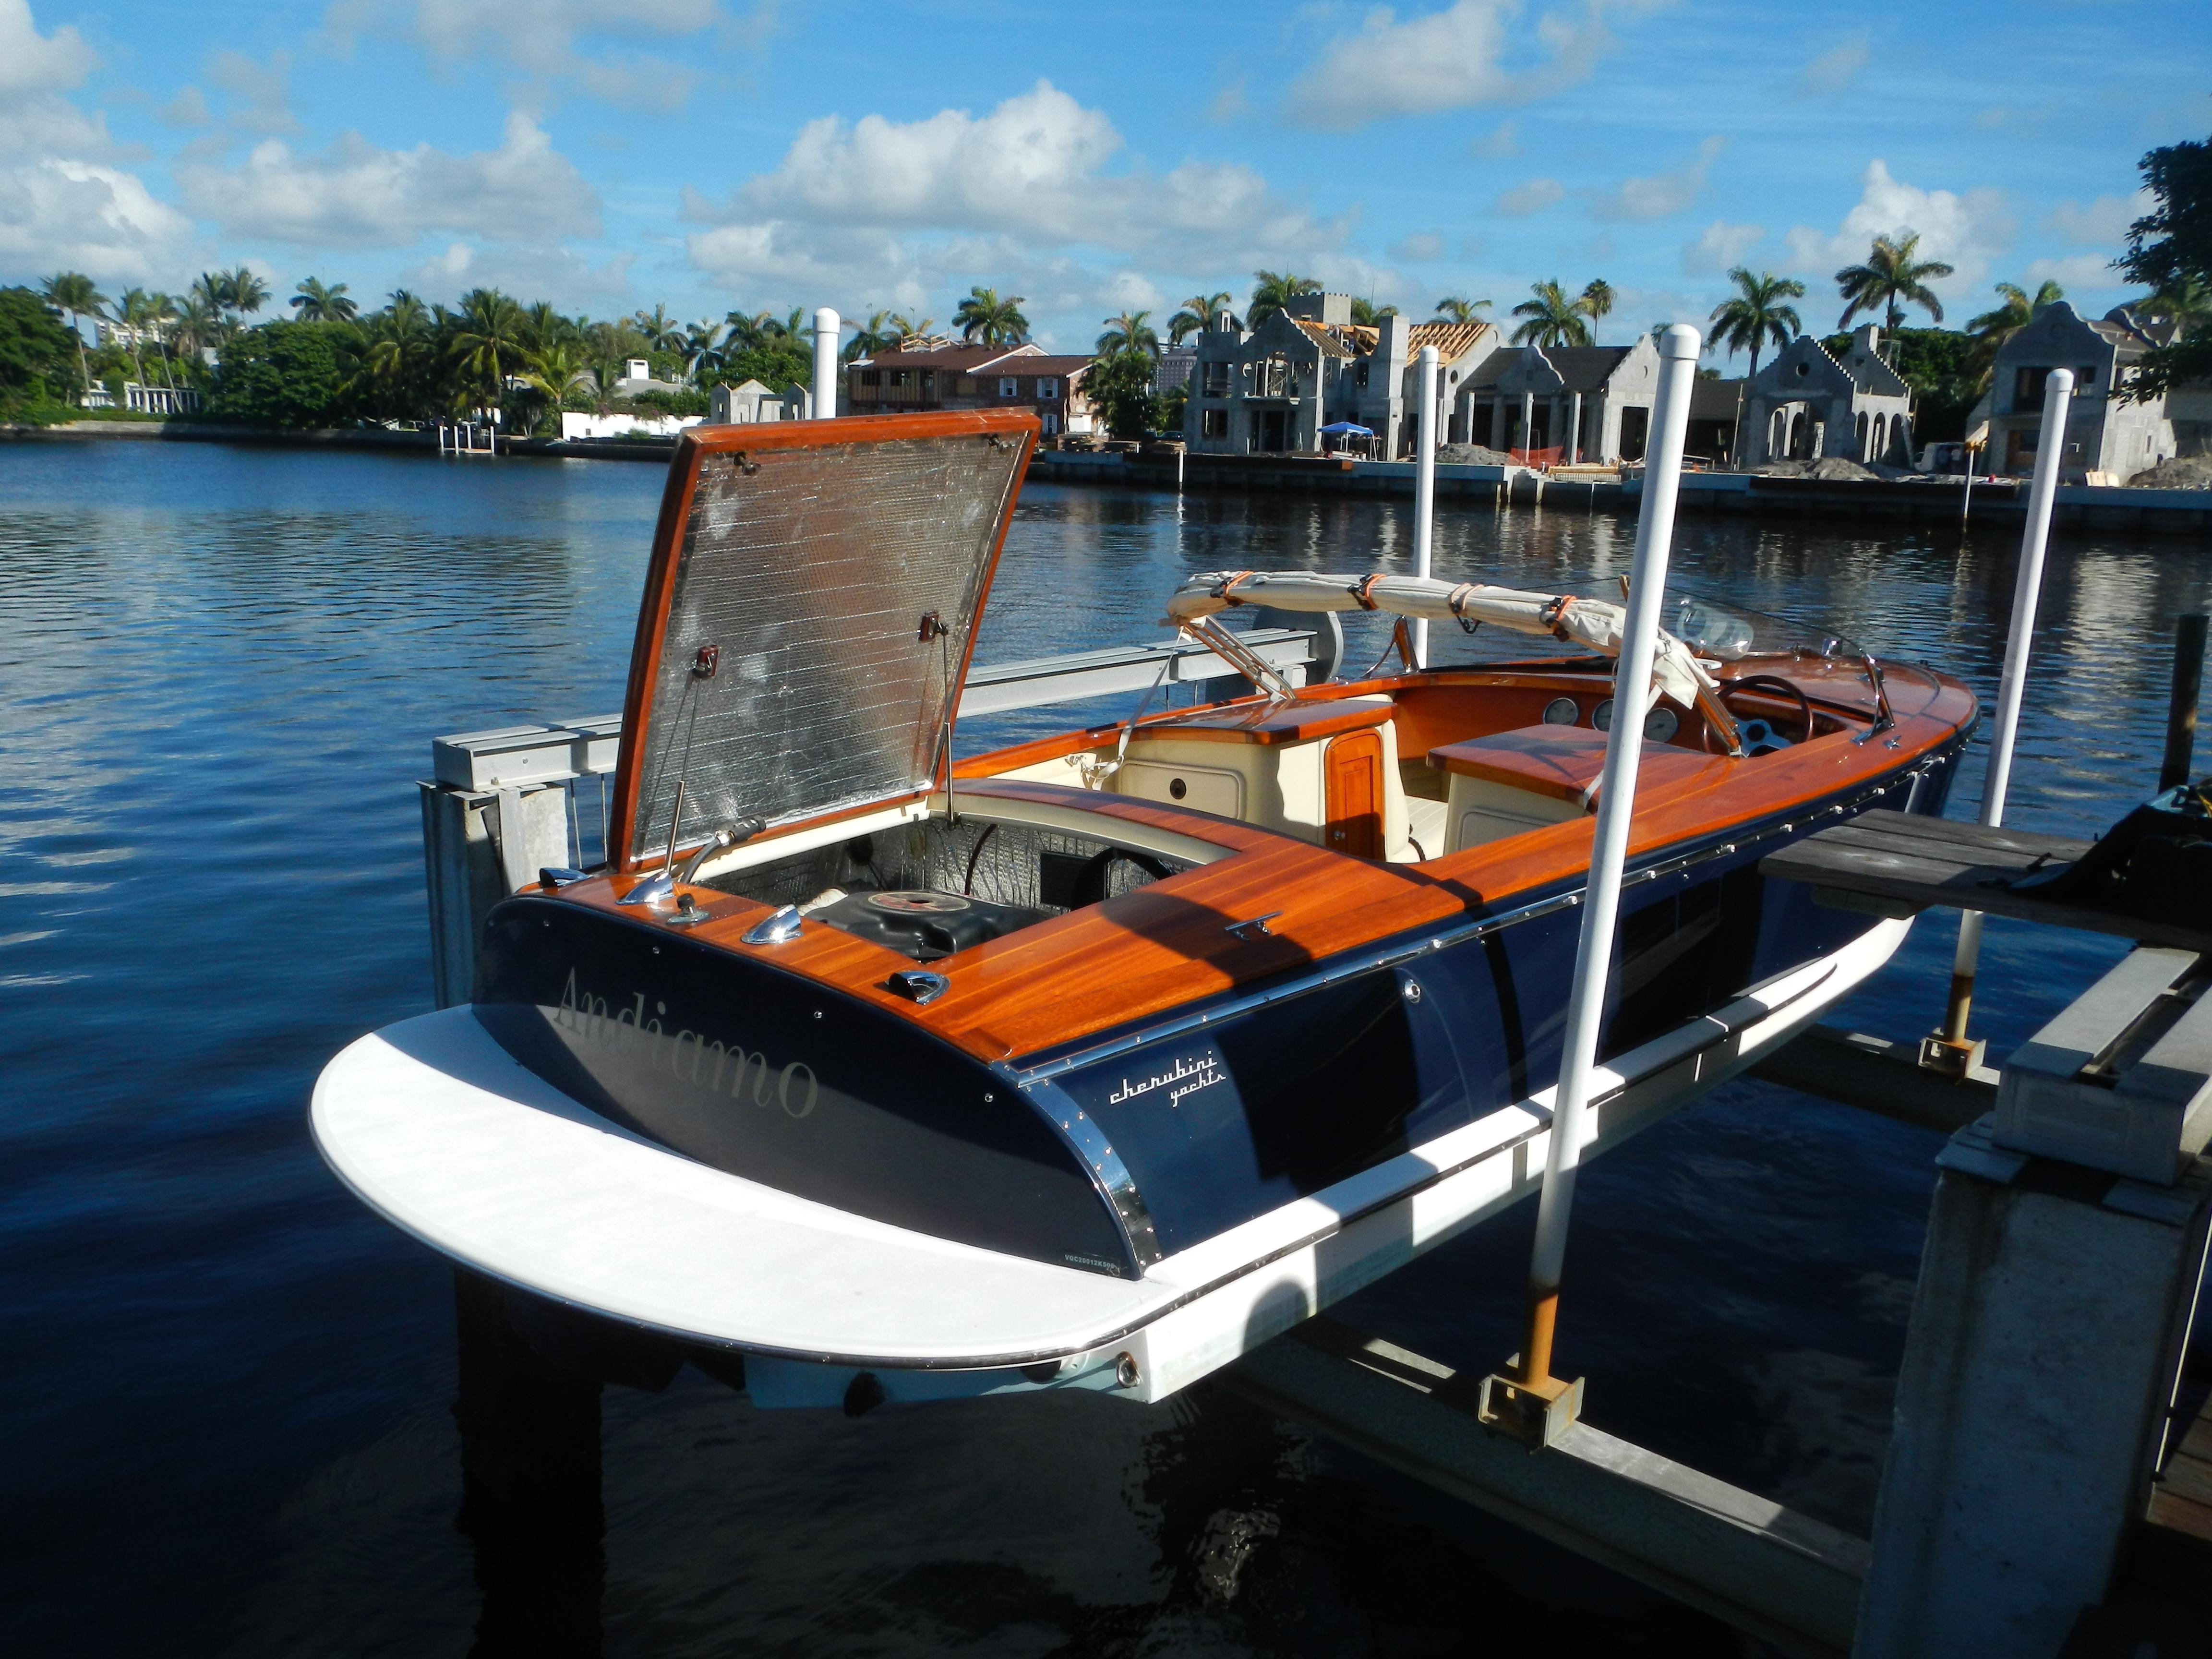 Cherubini classic, Fort Lauderdale